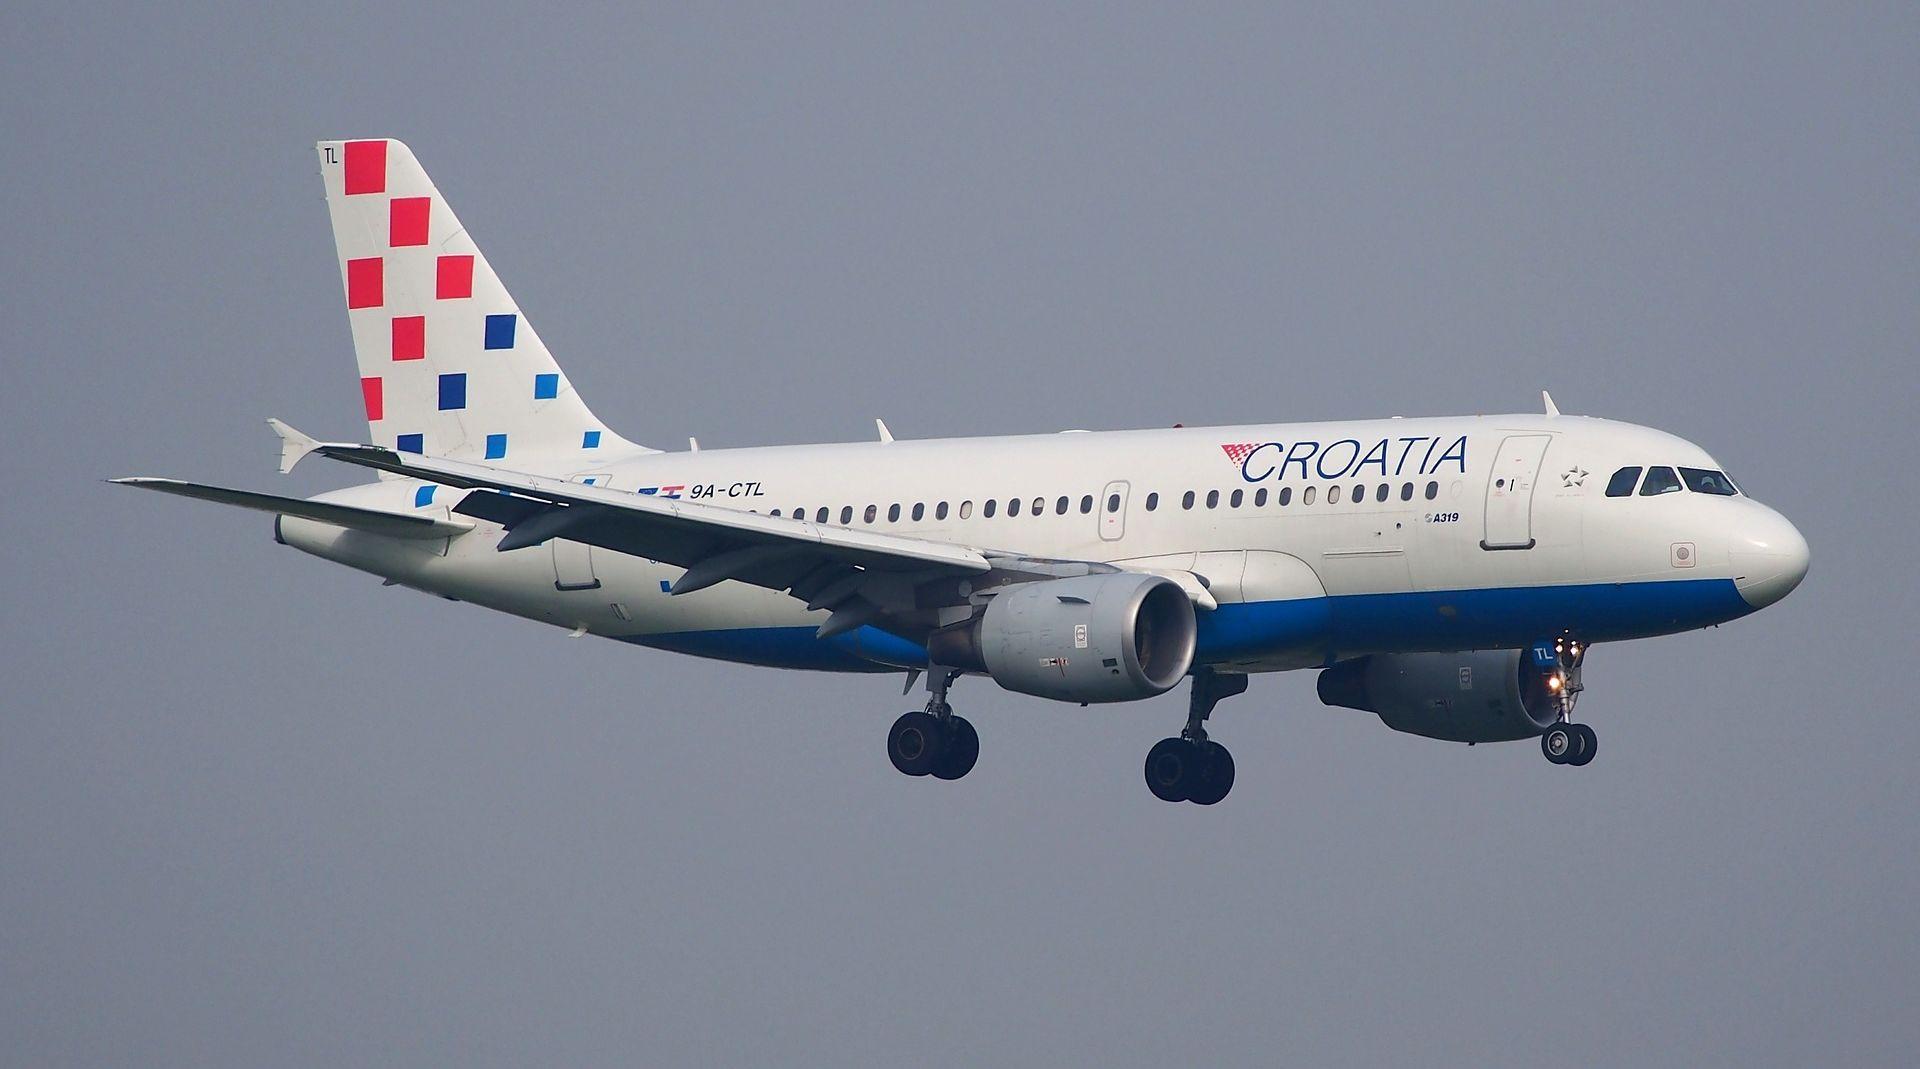 PANIKA NA LETU Avion se iznad Splita počeo tresti, preventivno preusmjeren u Zagreb